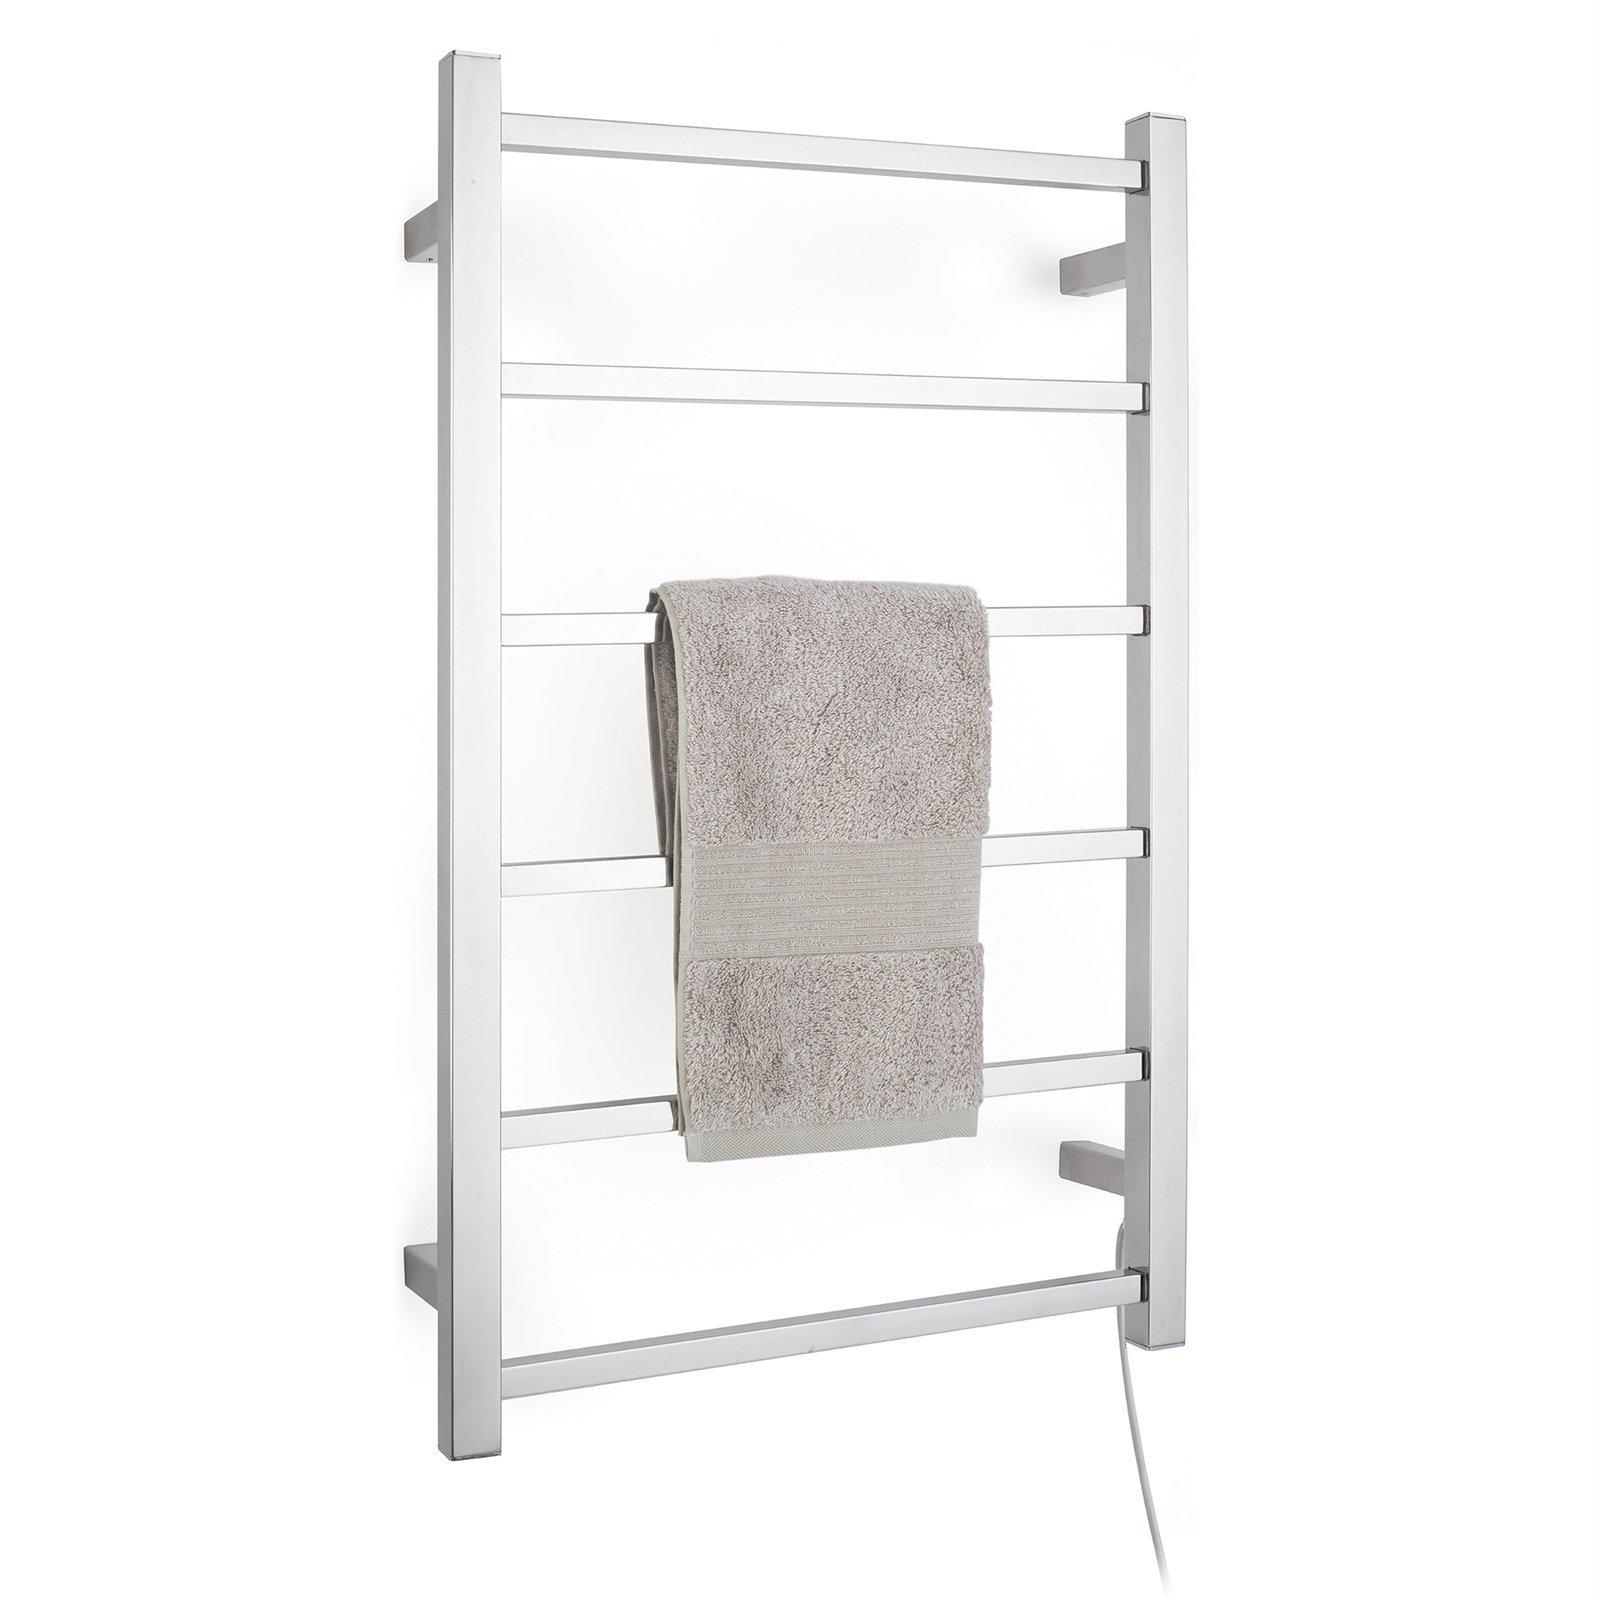 Arlec 6 Bar 65W Stainless Steel  Square Heated Towel Rail